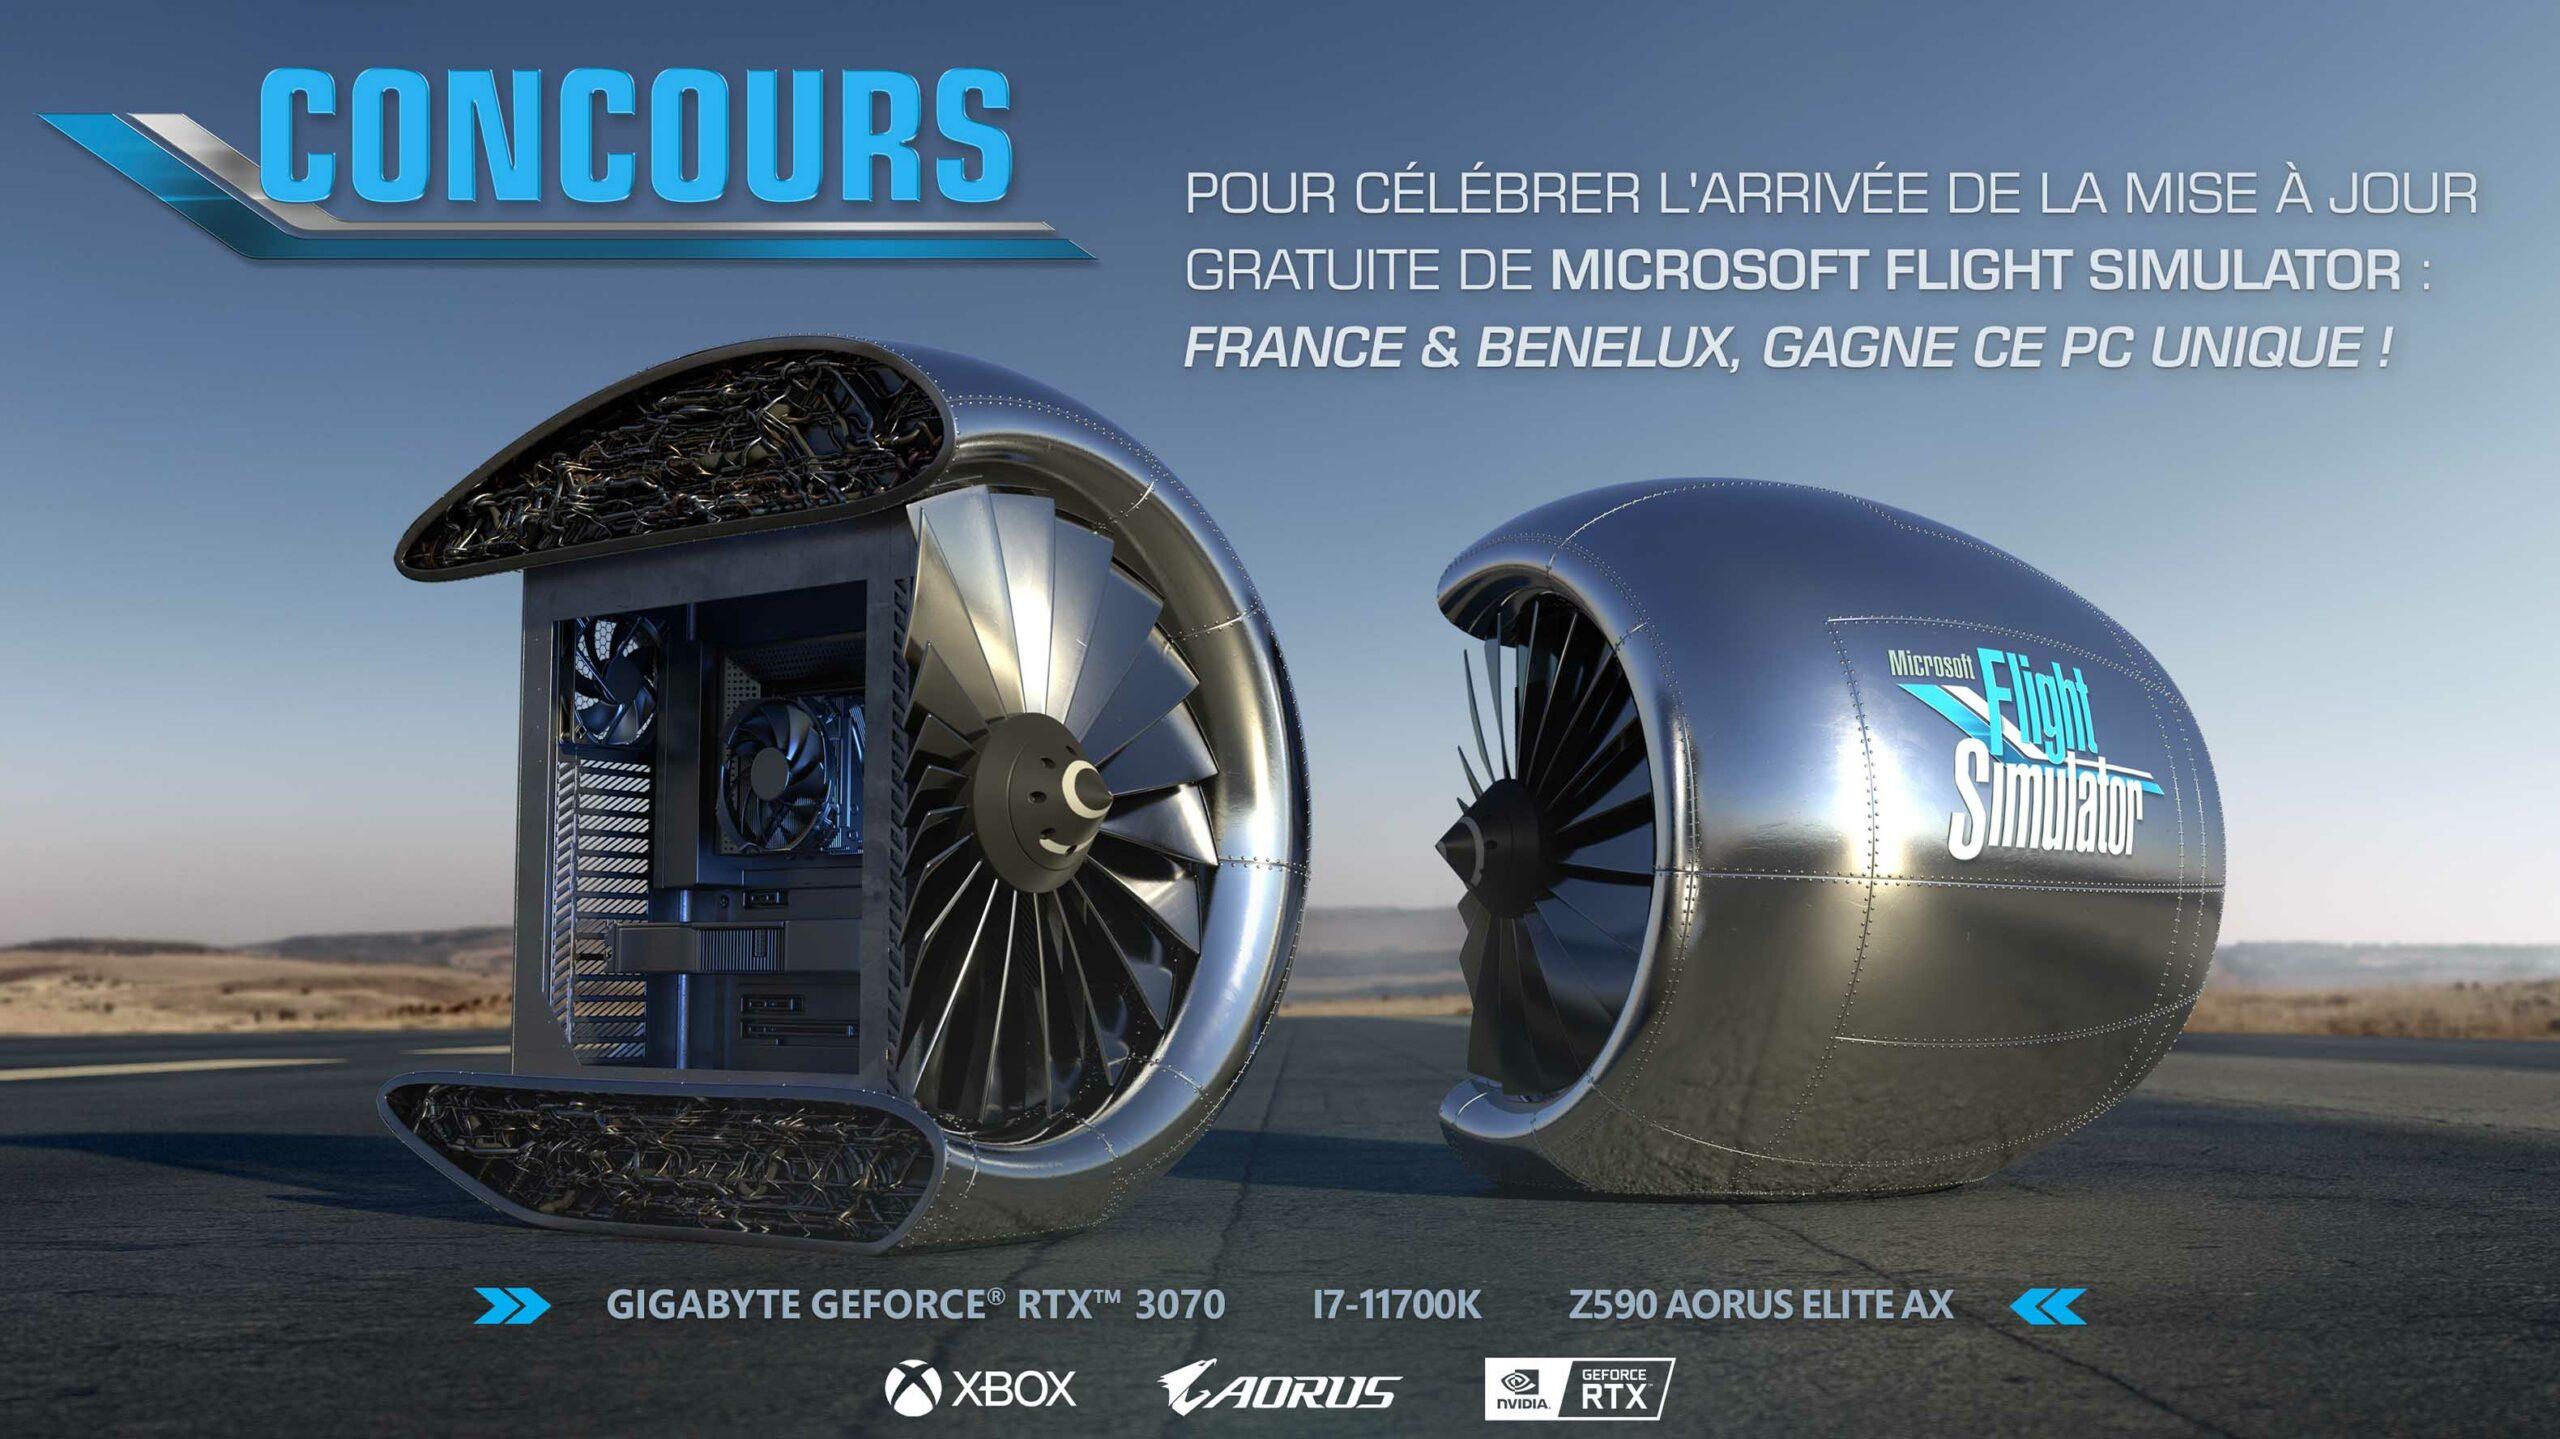 Microsoft's Flight Simulator giveaway PC